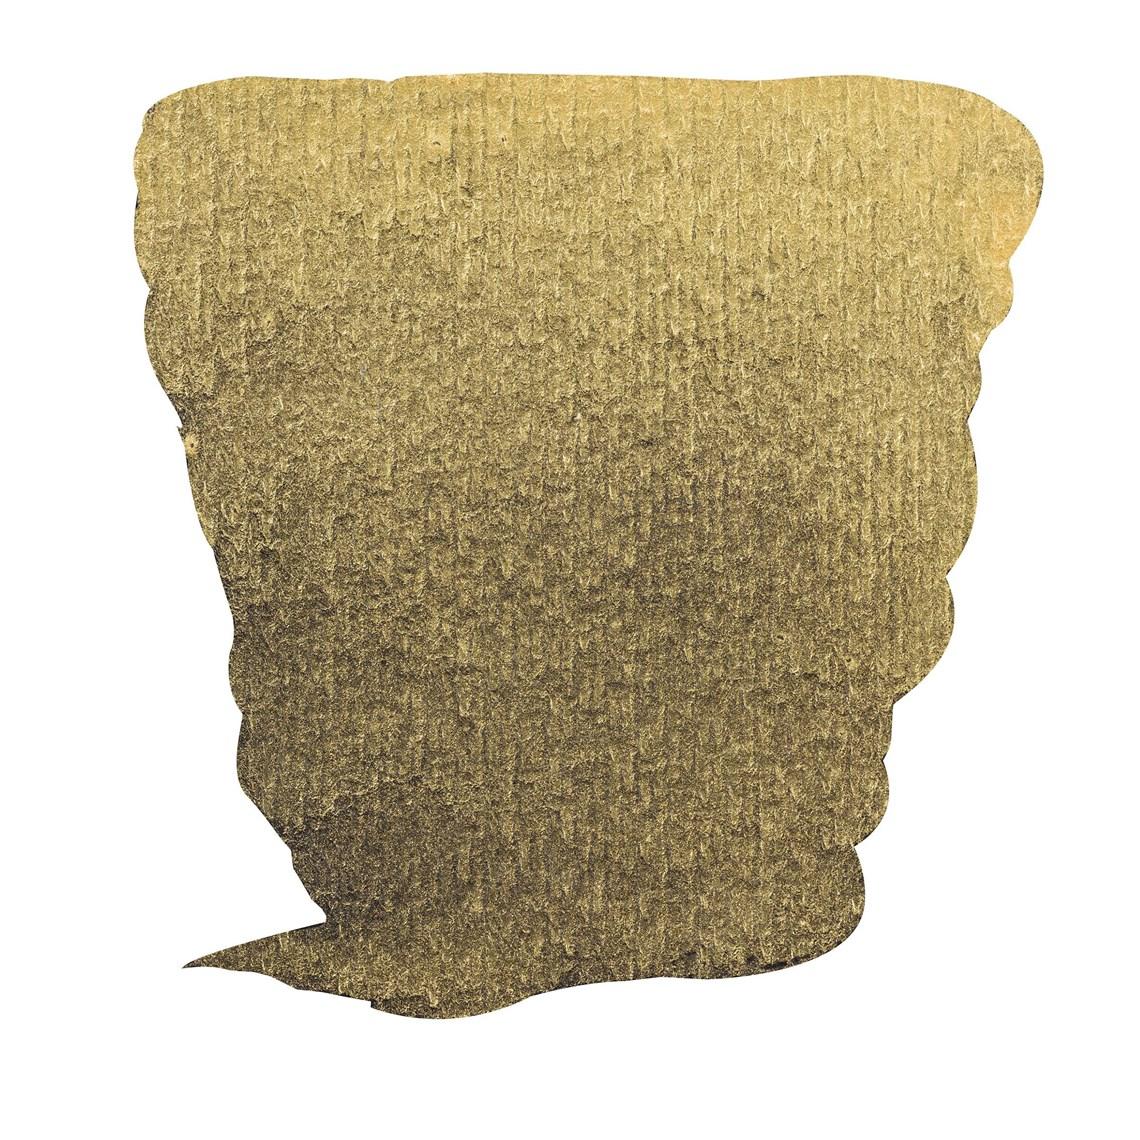 Aquarelverf Licht goud 802 tube 10 ml. Van Gogh